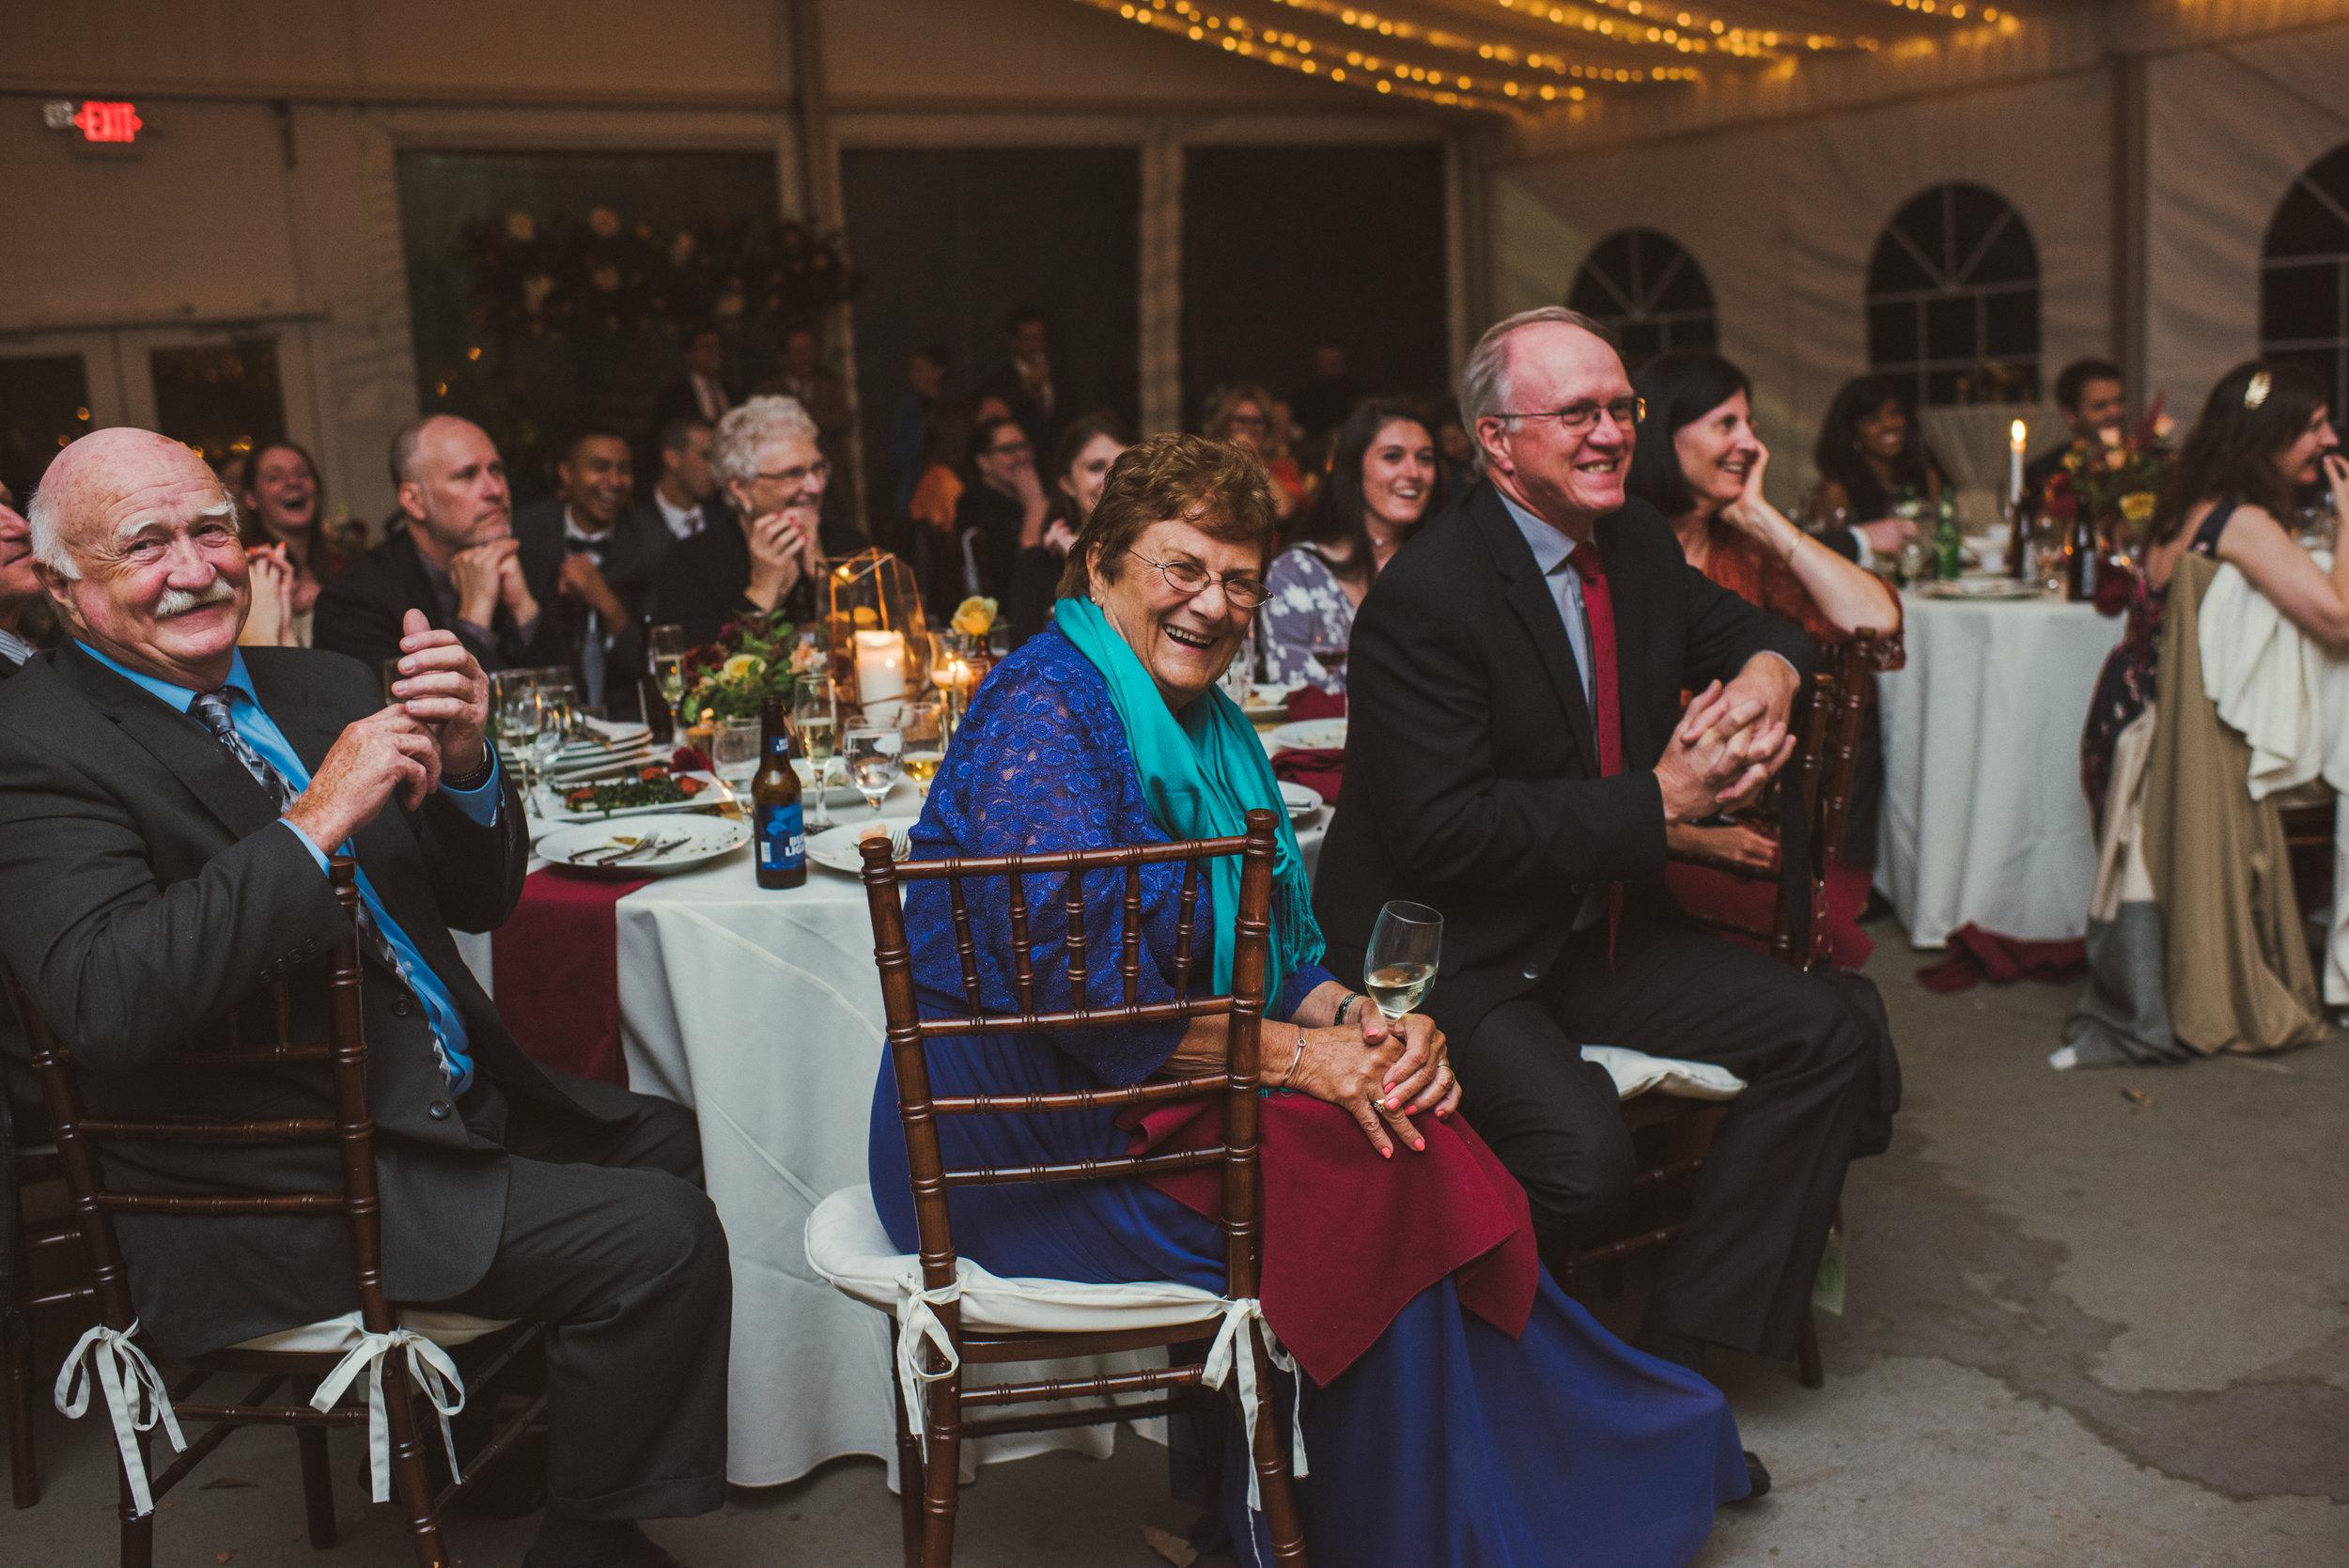 JACQUELINE & ANDREW WARSHAWER -BROOKMILL FARM FALL WEDDING - INTIMATE WEDDING PHOTOGRAPHER - TWOTWENTY by CHI-CHI AGBIM-631.jpg